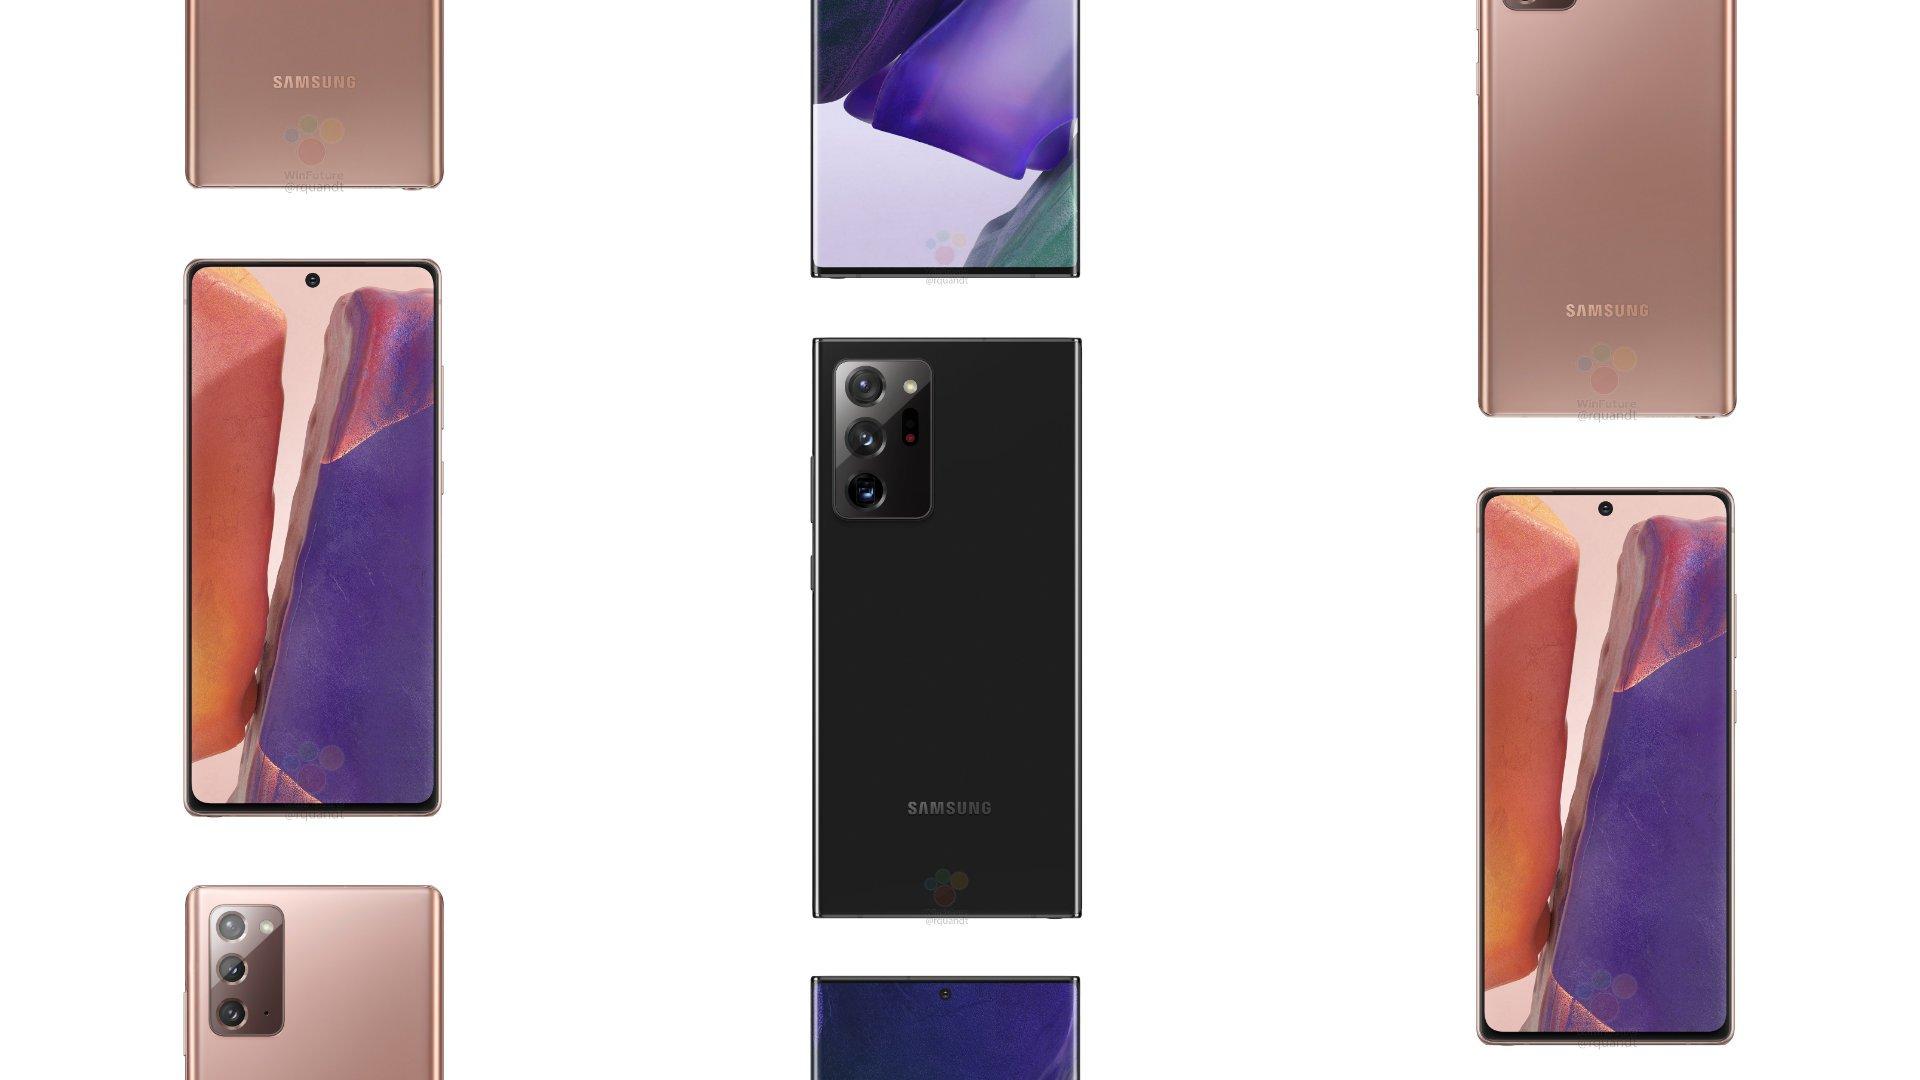 Samsung Galaxy Note 20 4